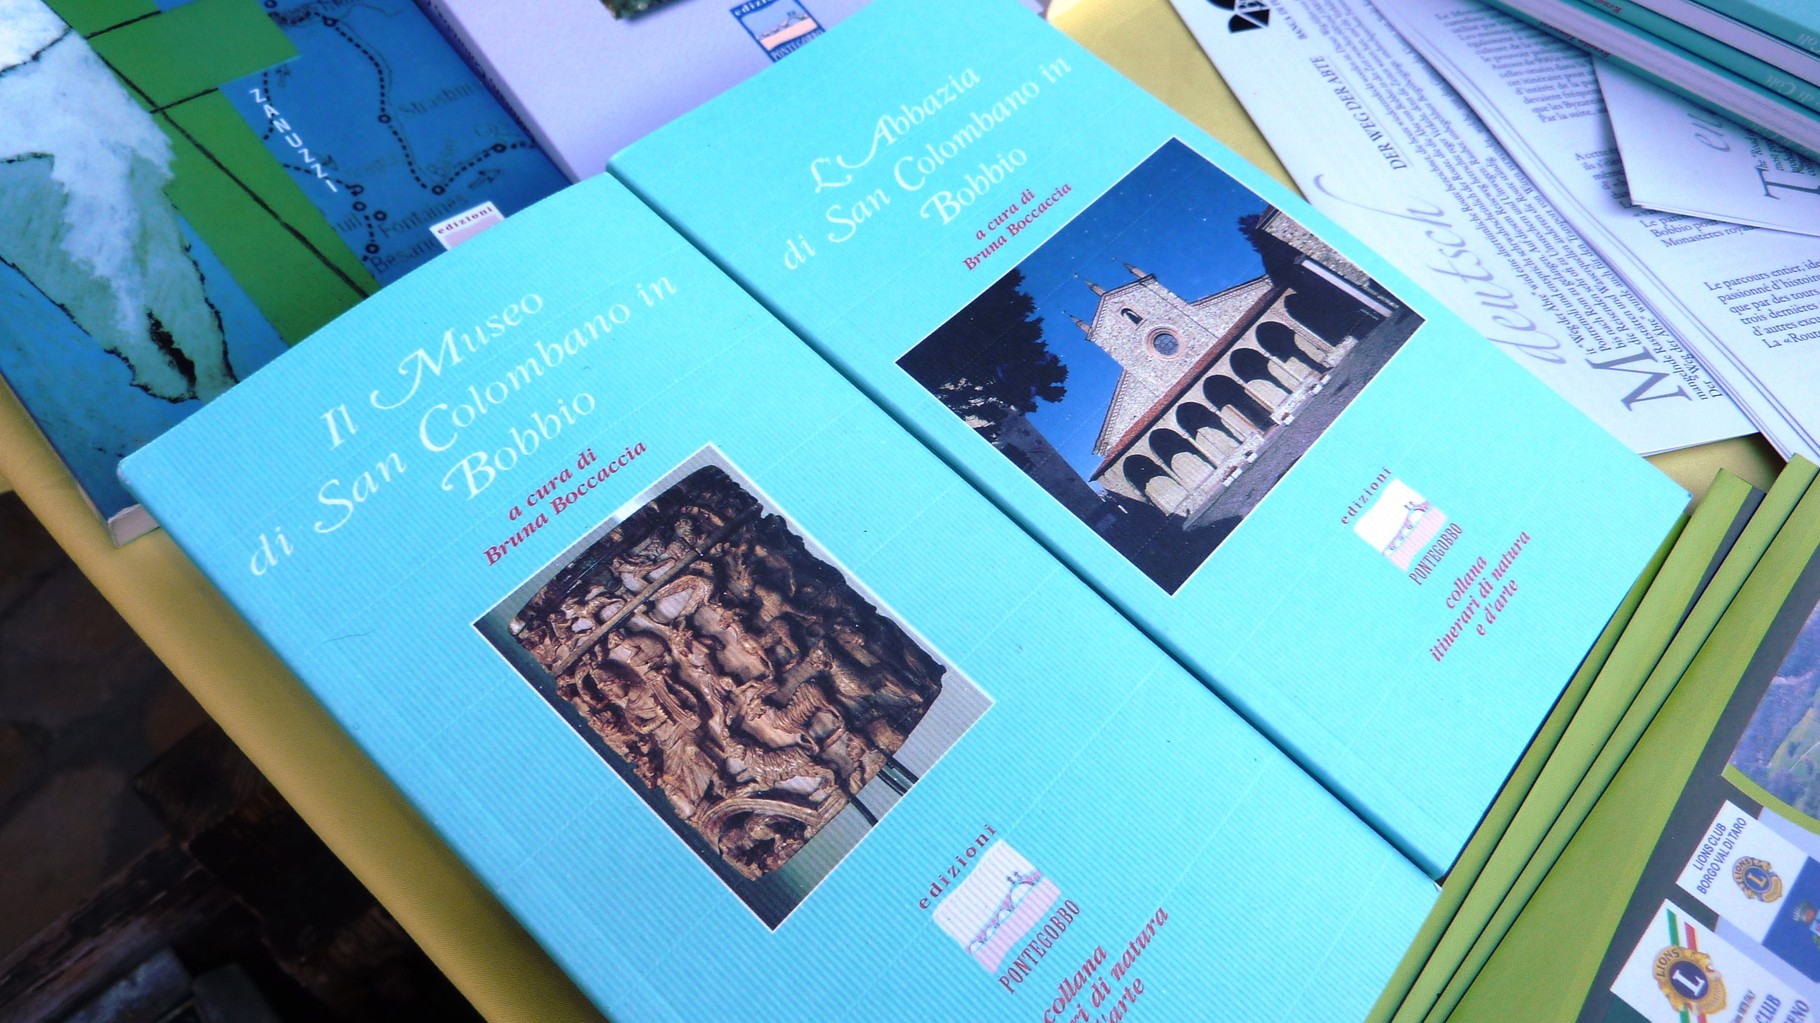 edizioni Pontegobbo